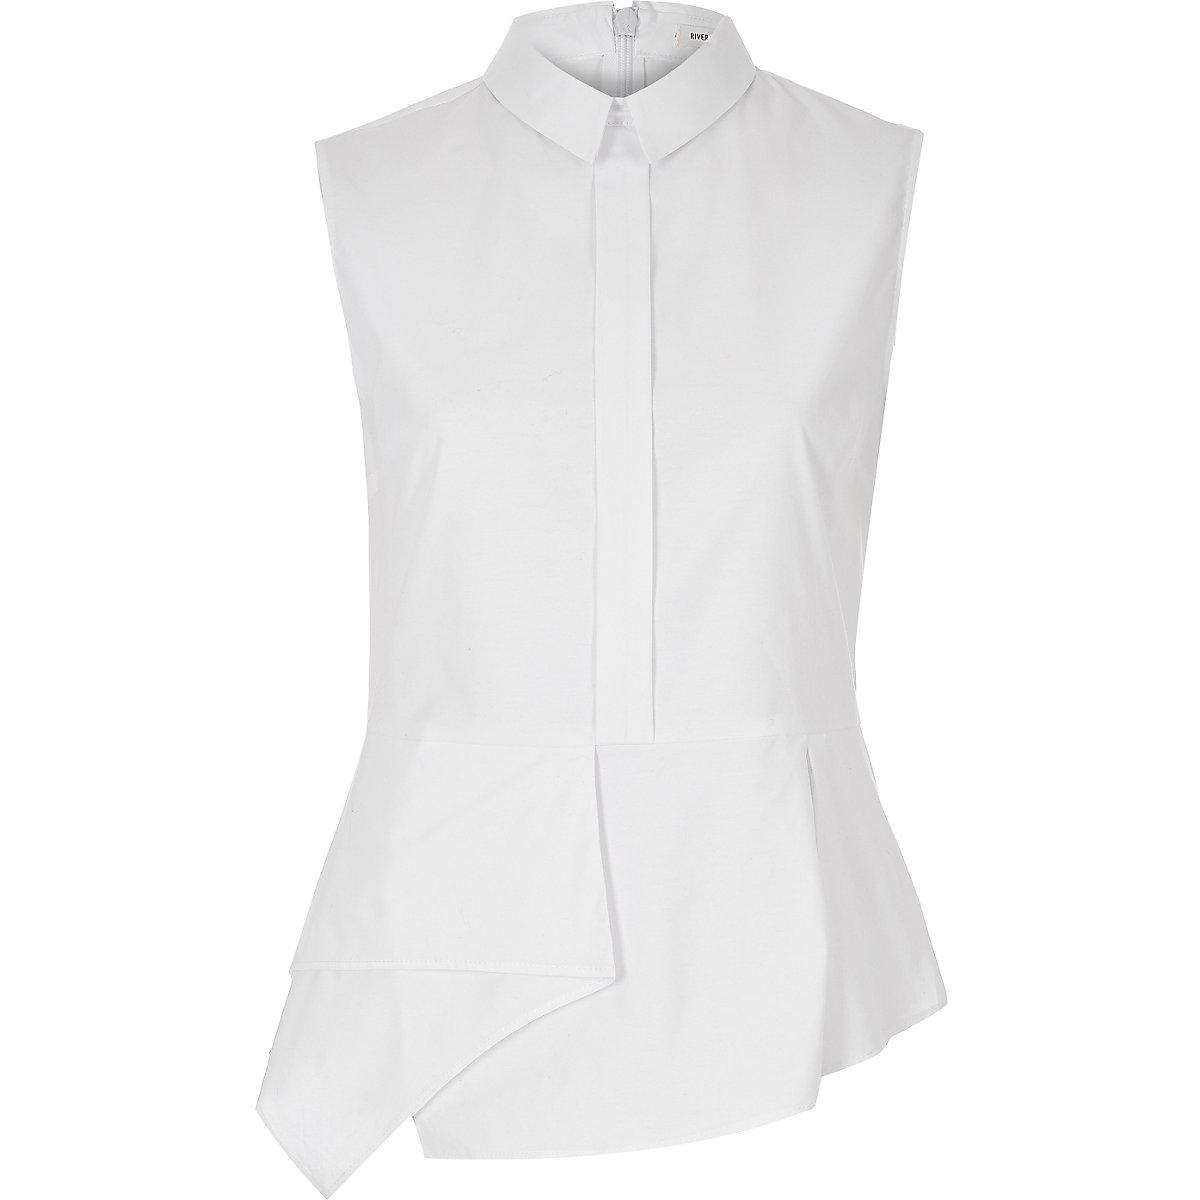 6faf74db75d7b4 White sleeveless peplum shirt - Shirts - Tops - women